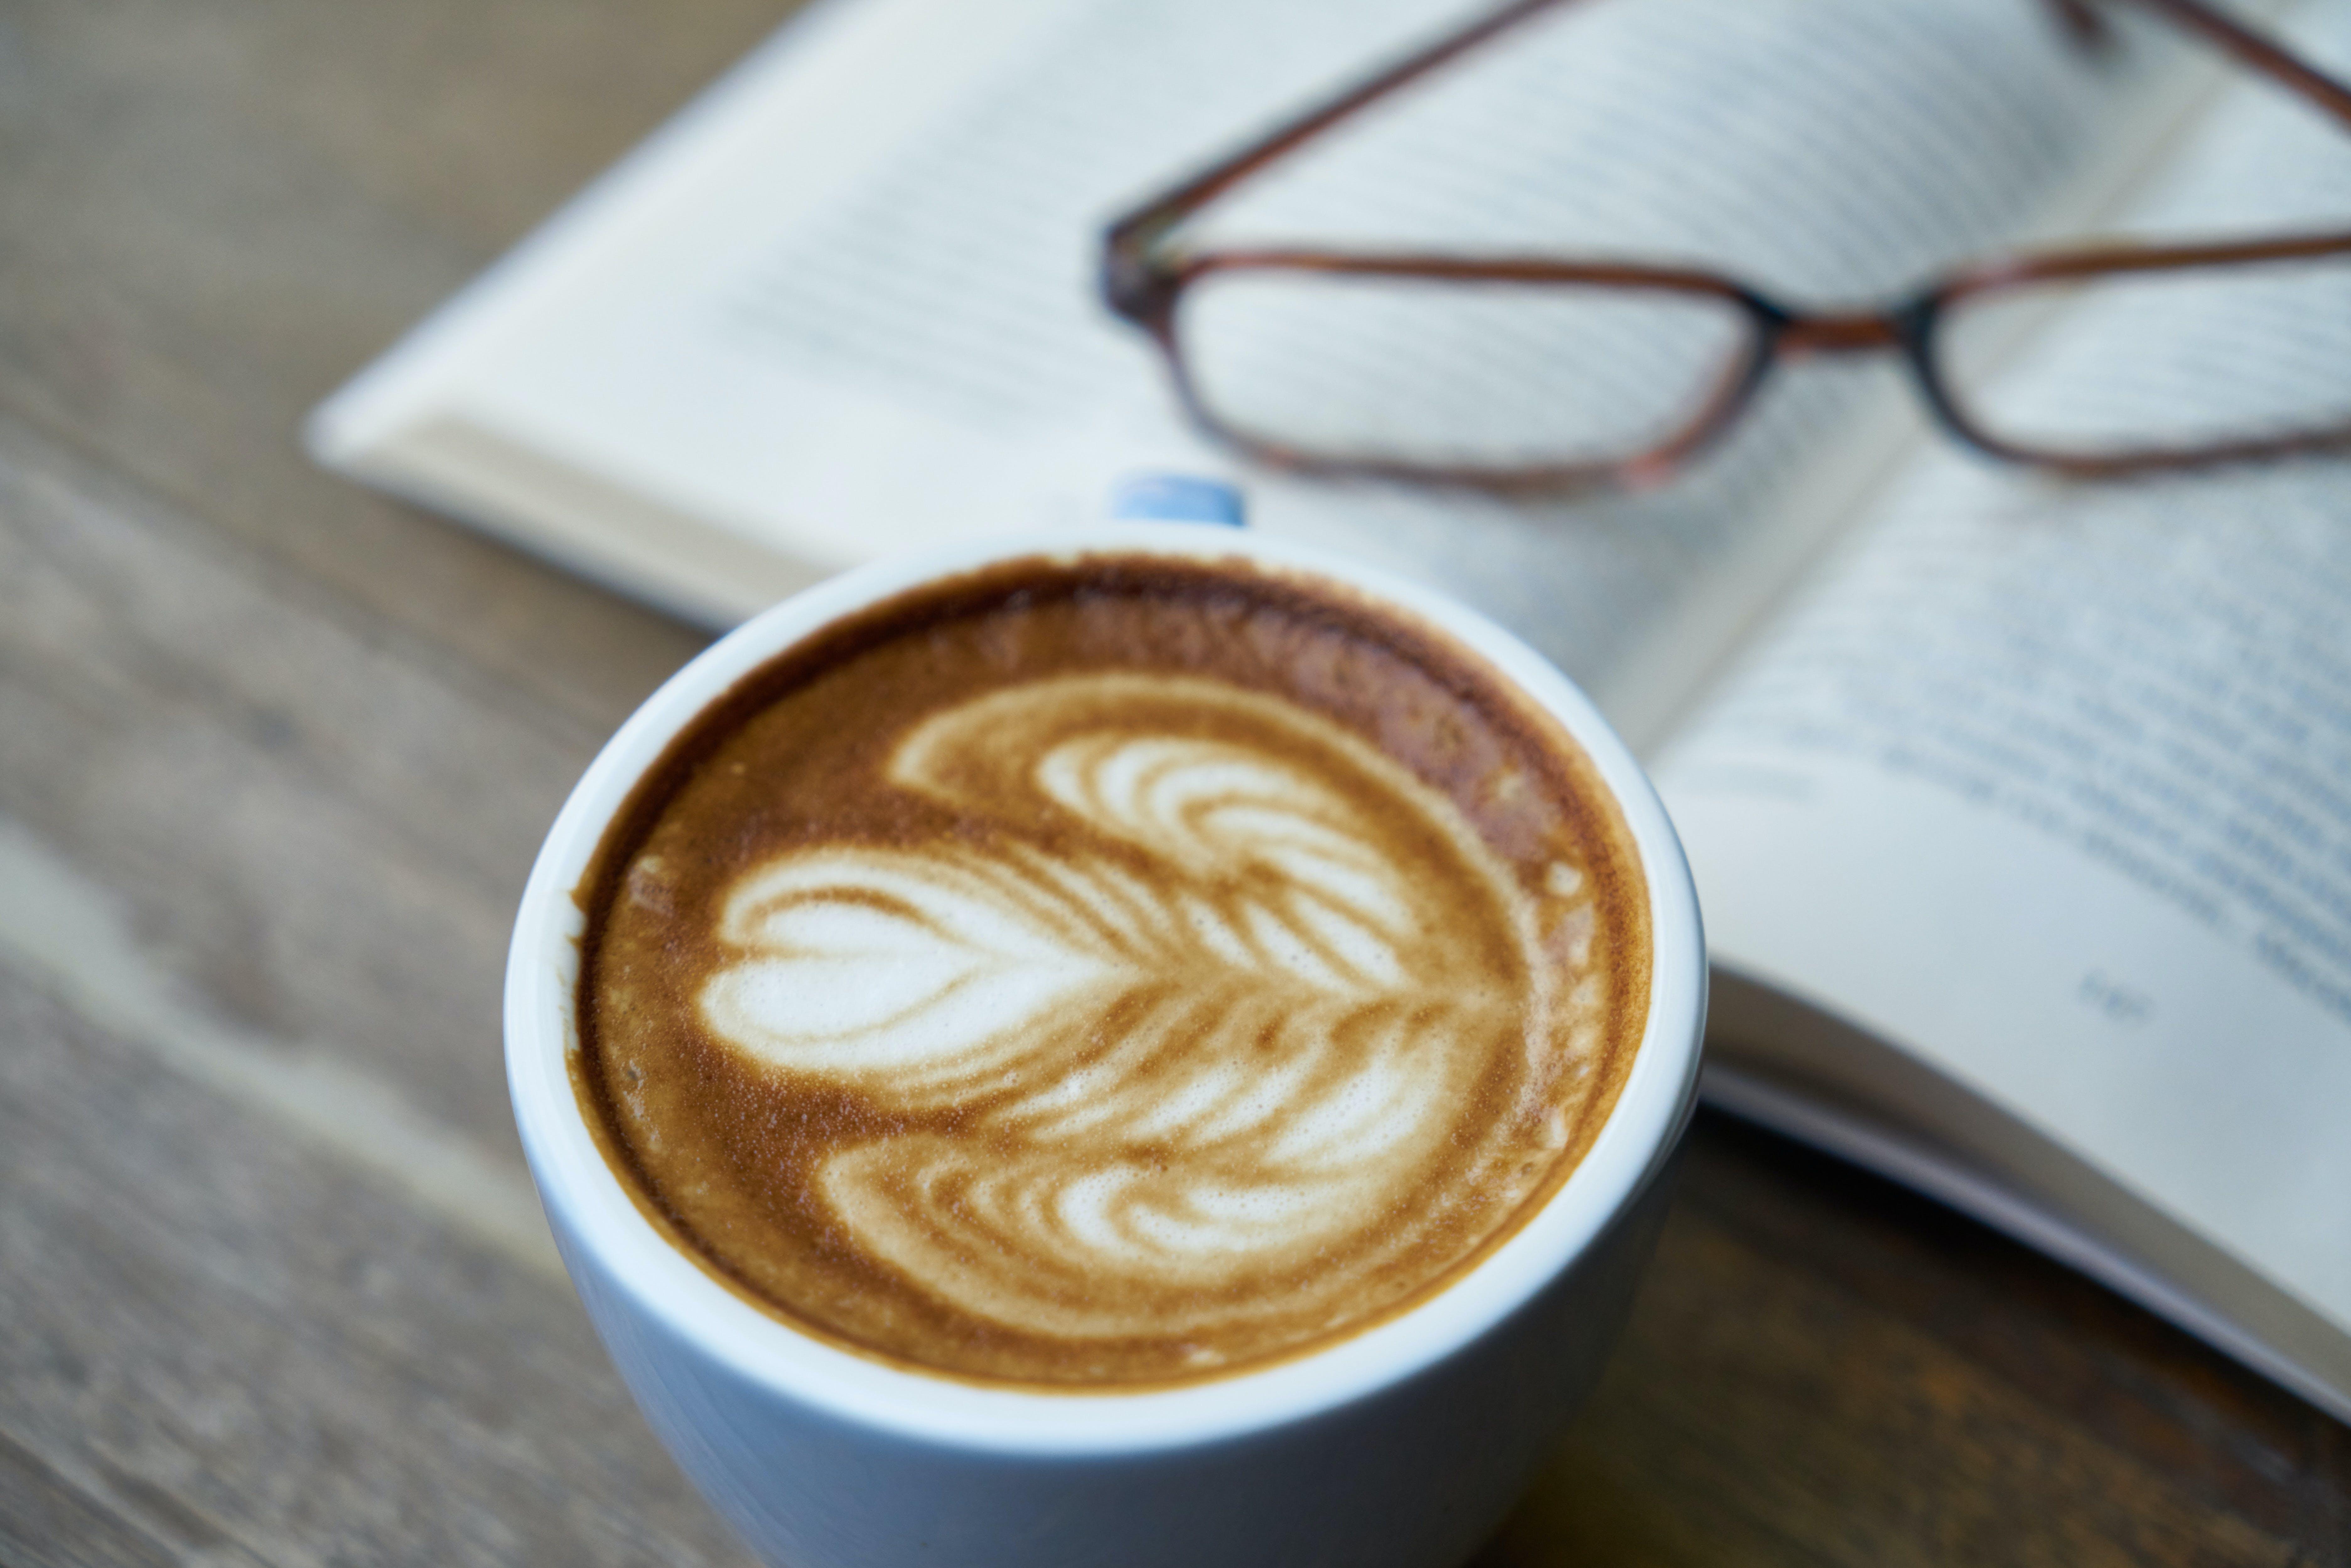 Coffee Latte in Ceramic Mug